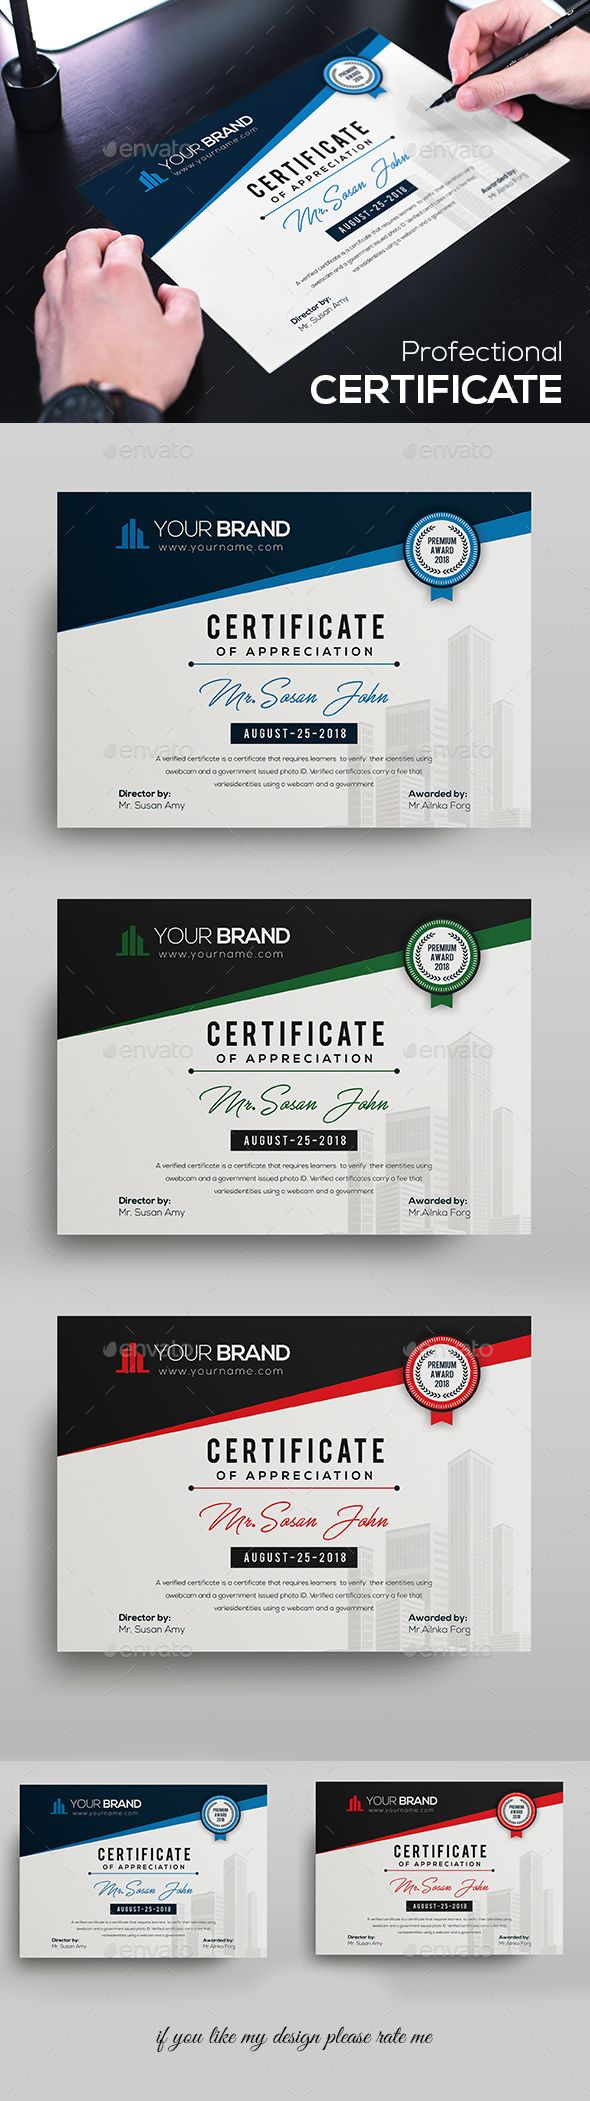 Certificate Design Template PSD. Download   Certificate Templates ...